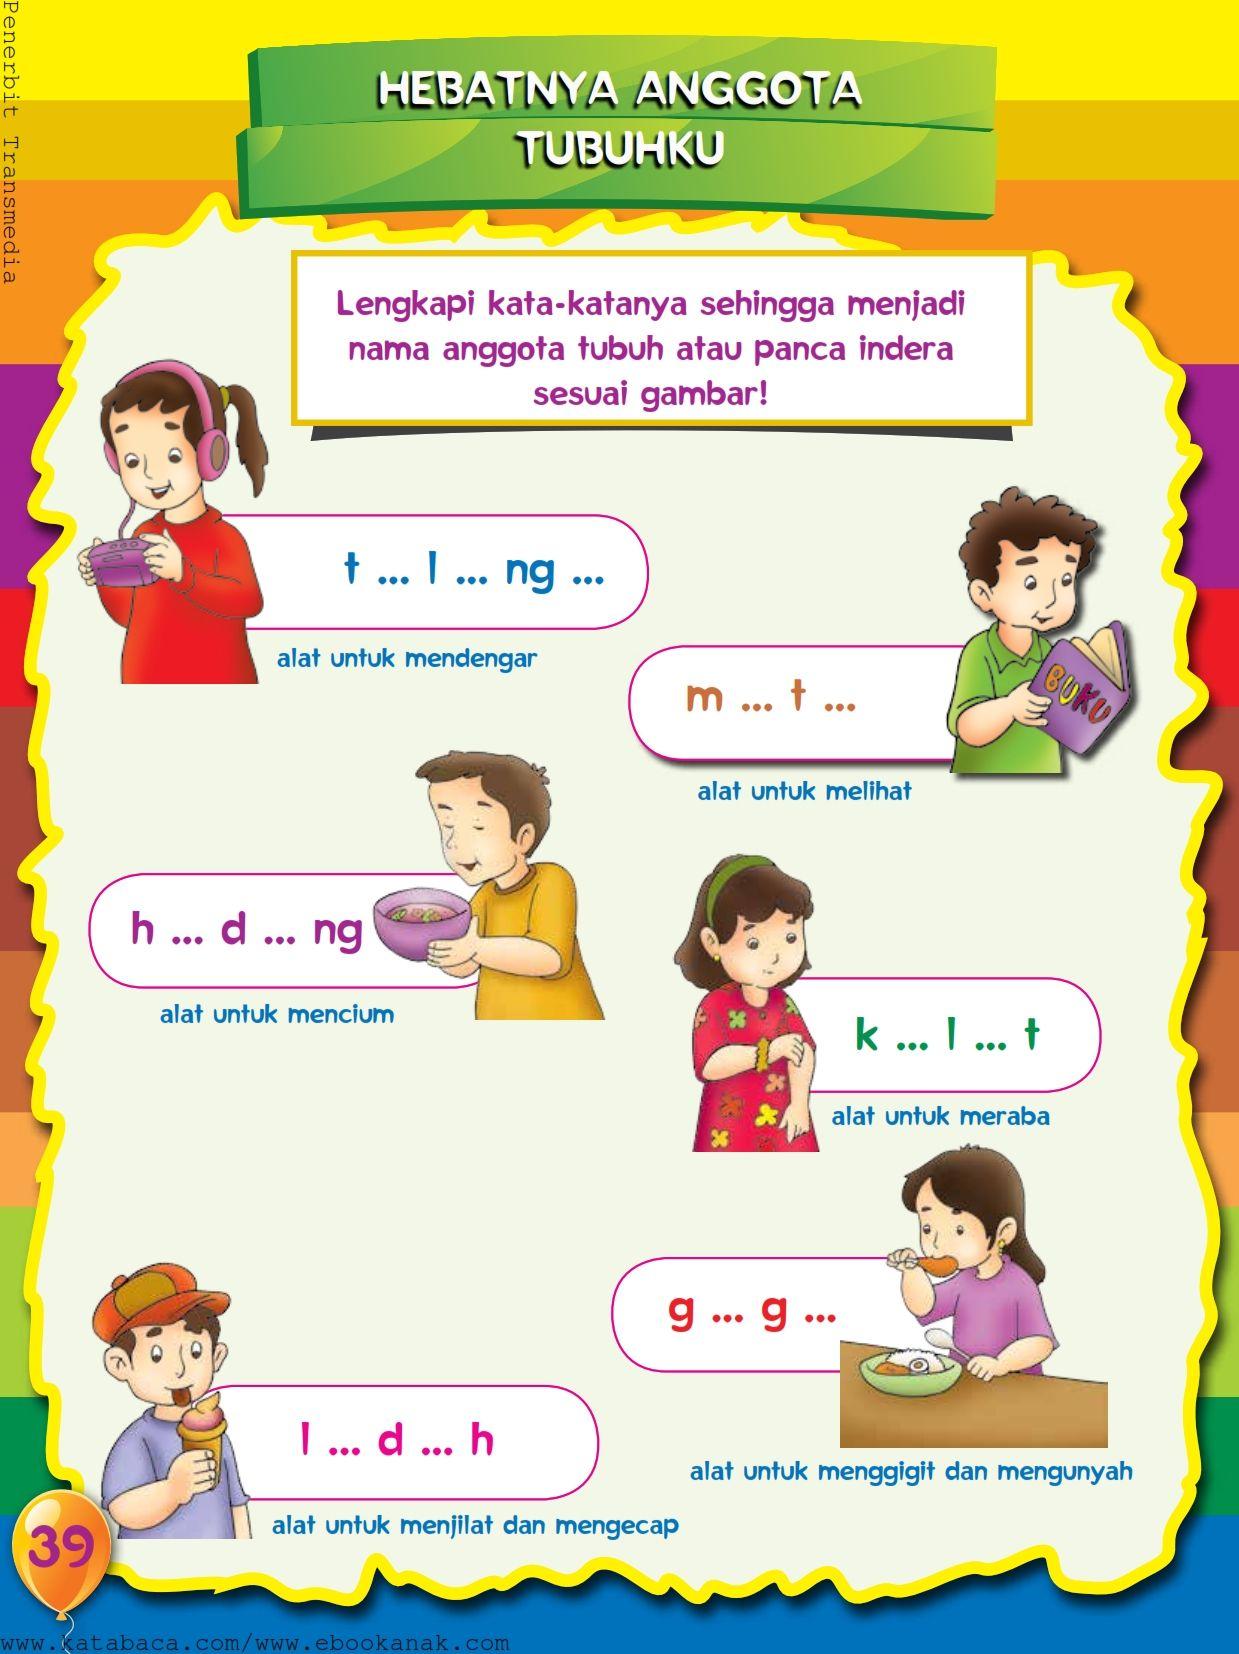 Worksheet Religi Anak Tk Printable Worksheets And Activities For Teachers Parents Tutors And Homeschool Families